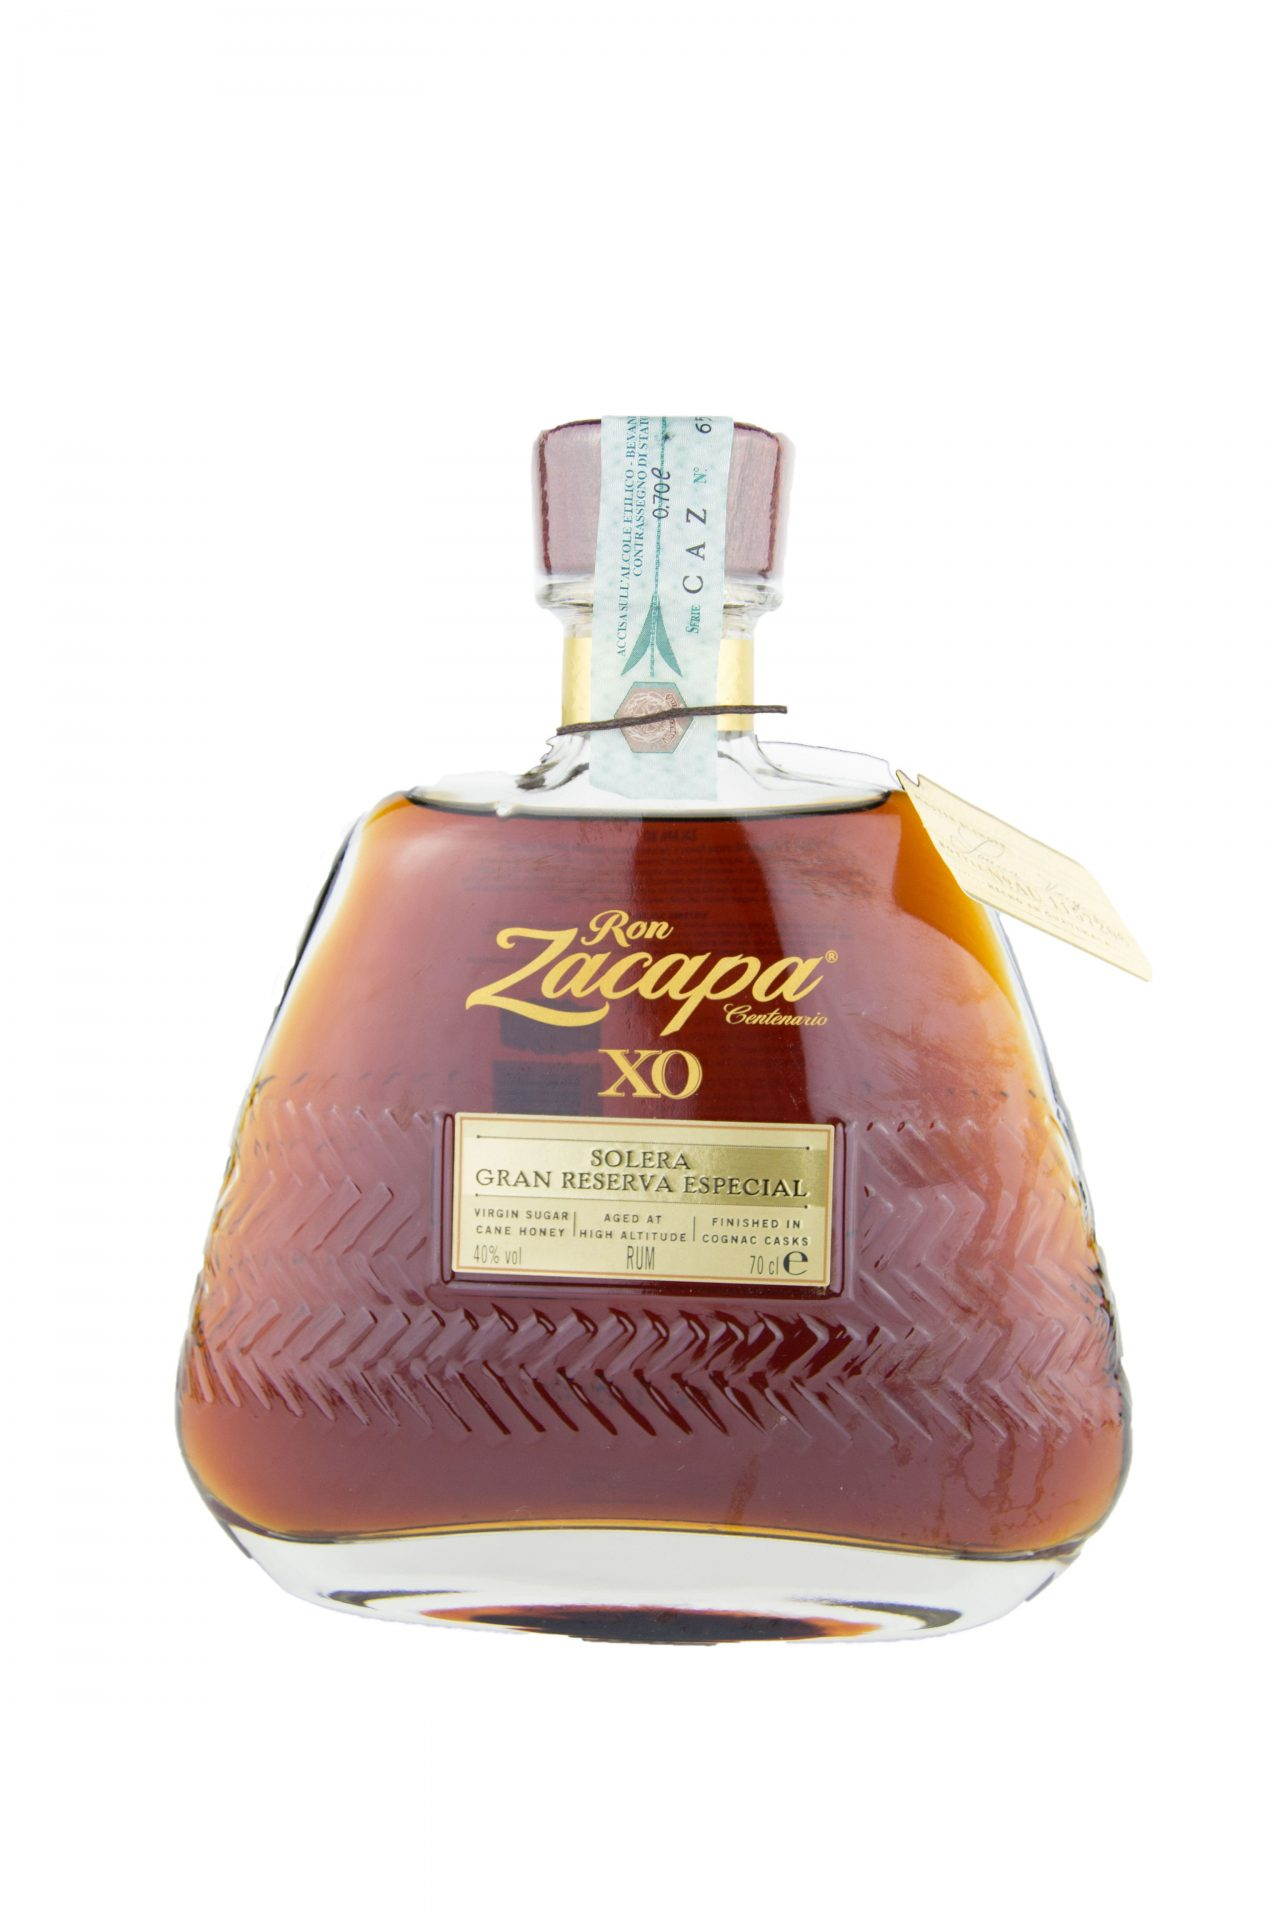 Ron Zacapa – XO Solera Gran Reserva Especial